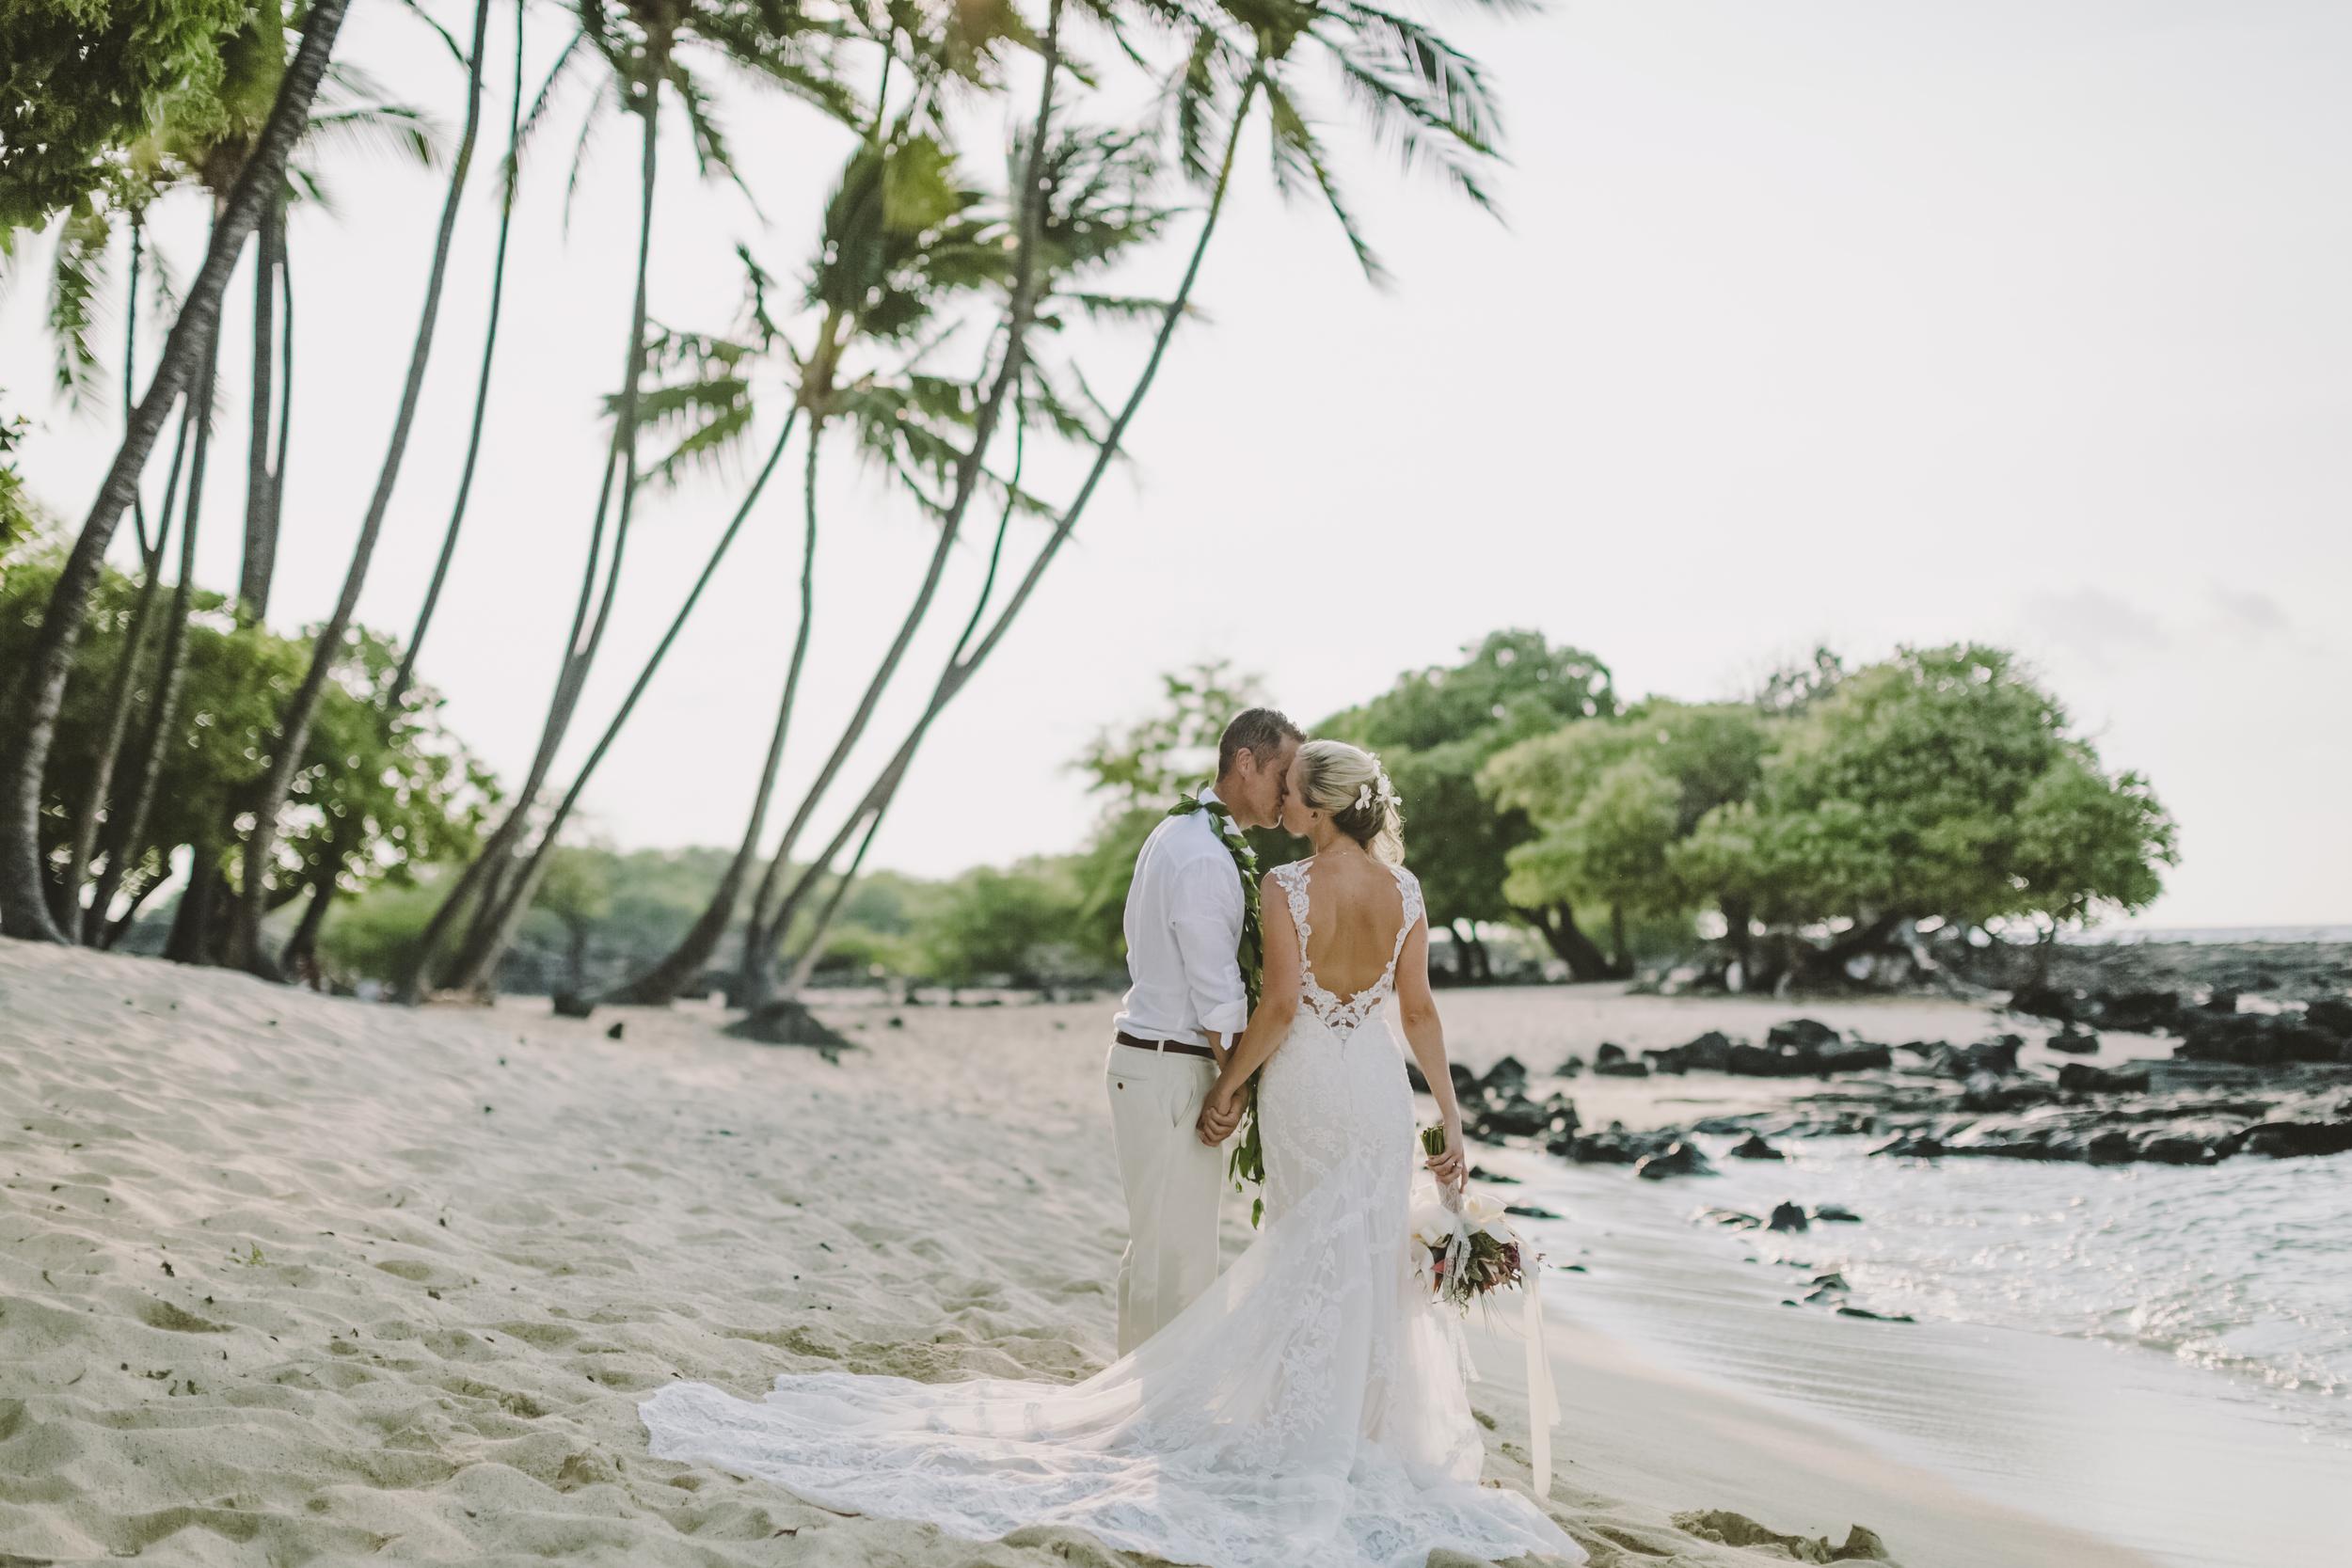 angie-diaz-photography-hawaii-wedding-photographer-kelli-jay-92.jpg